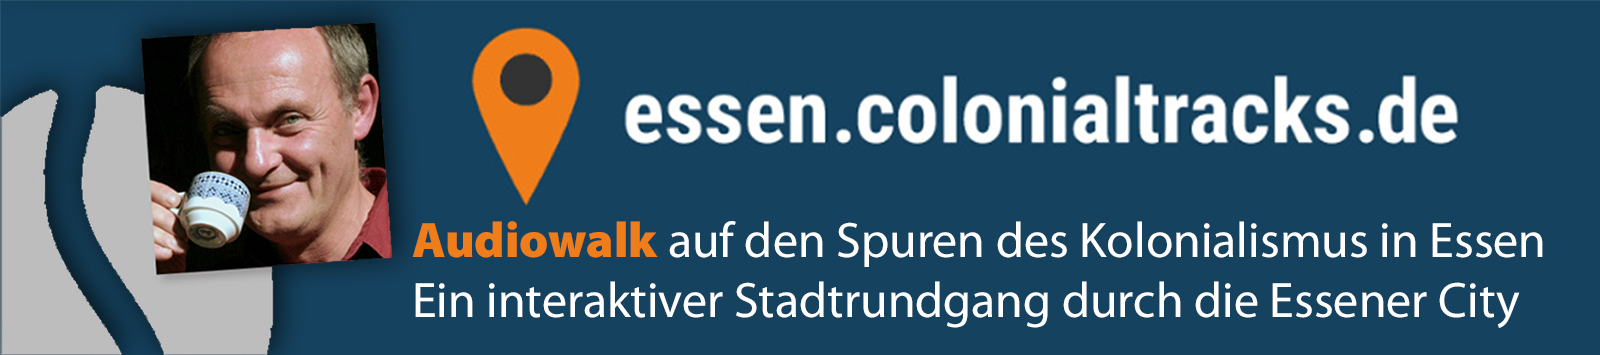 derRÖSTER Alex Kunkel mit mehreren Beiträgen im AUDIO-WALK essen.colonialtracks.de